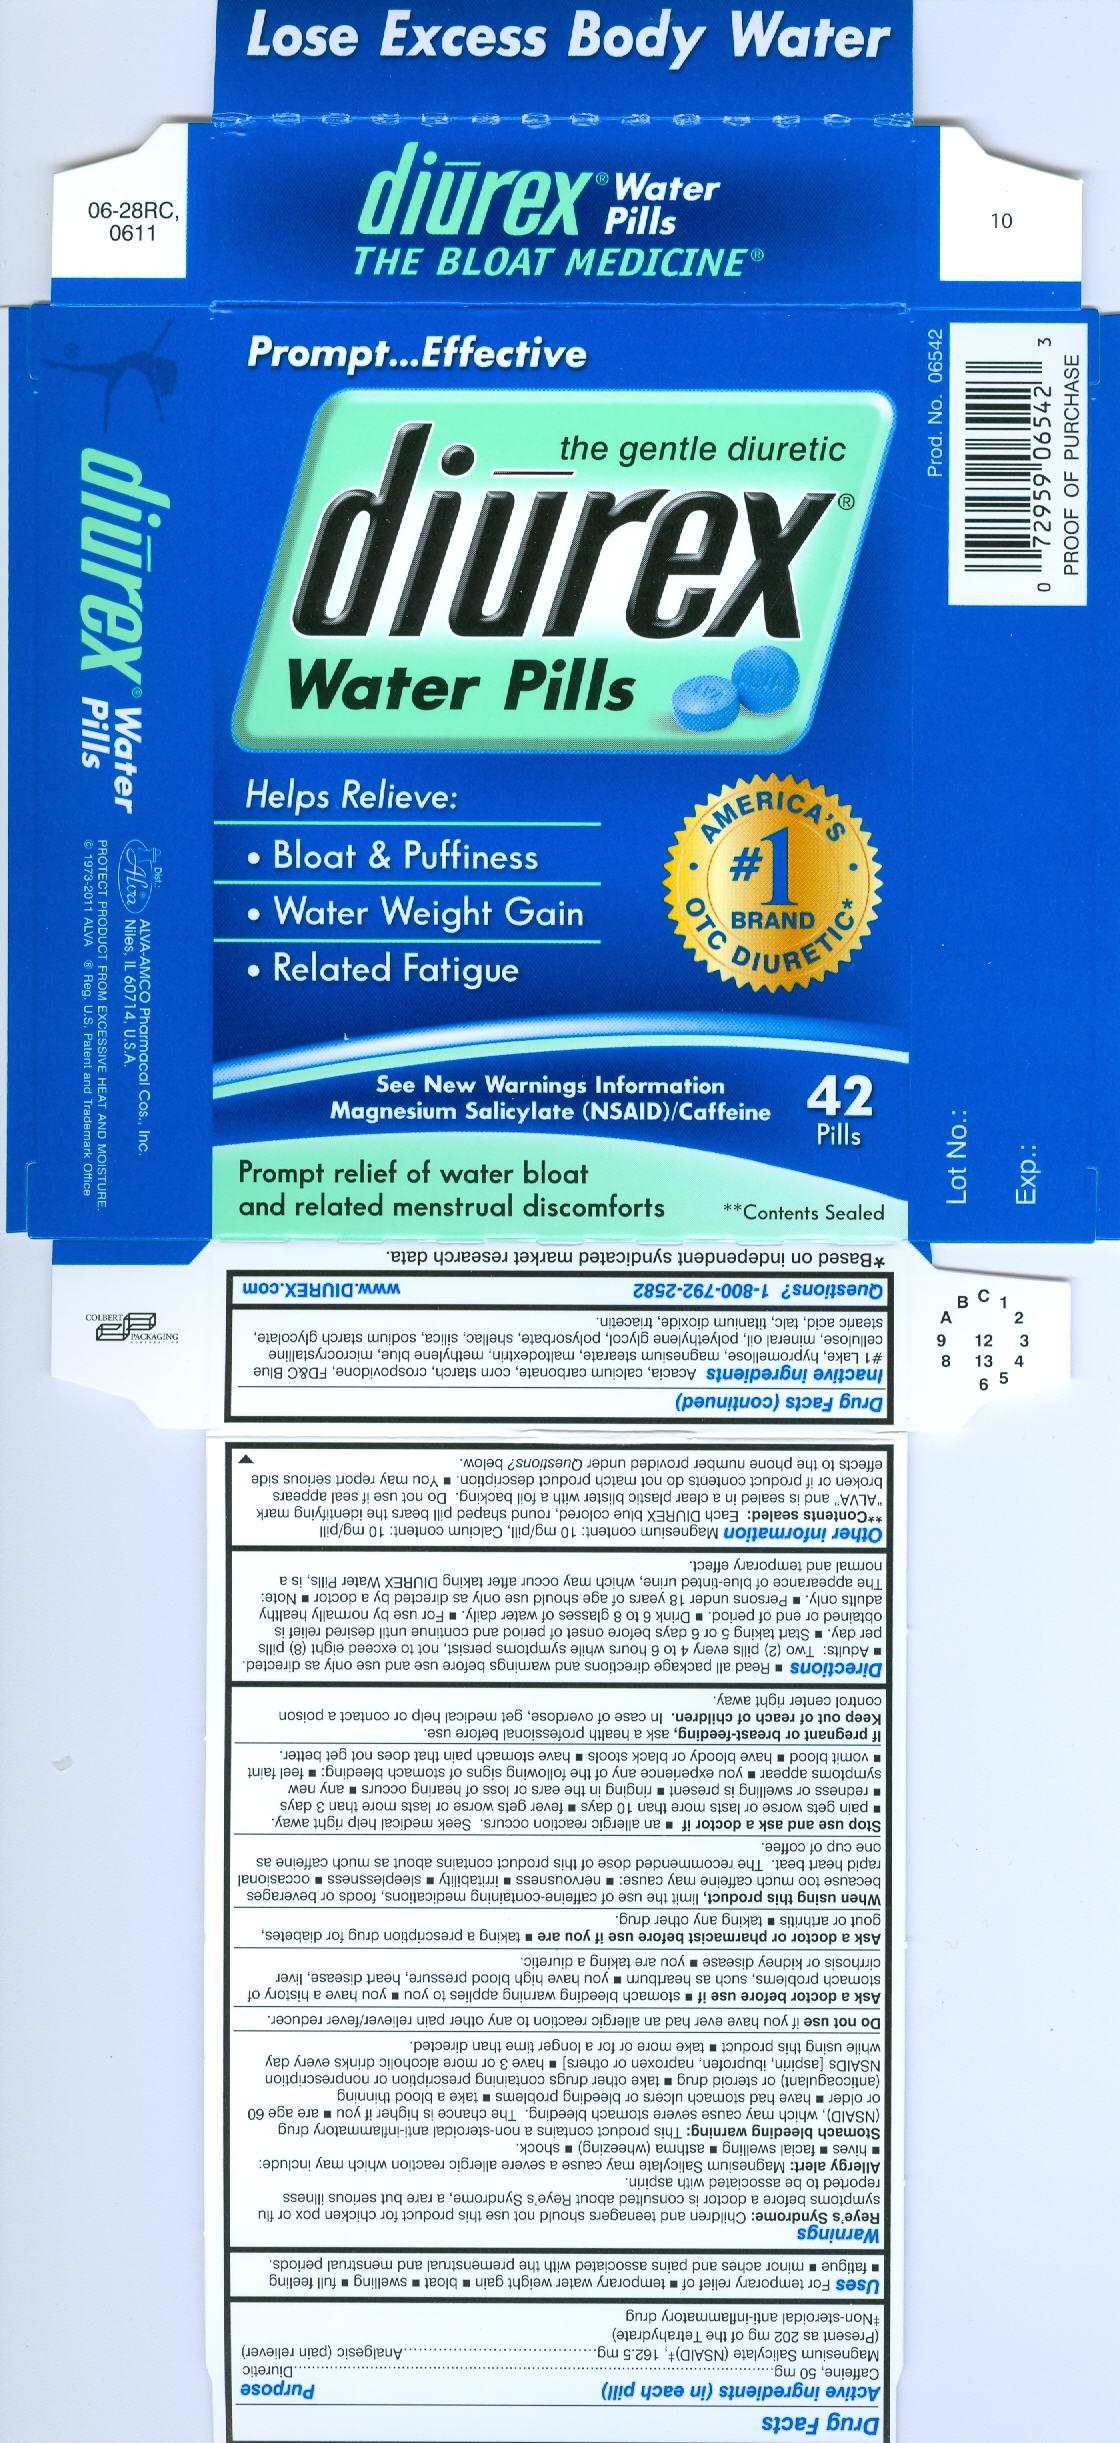 Diurex Water Capsules Water Ionizer